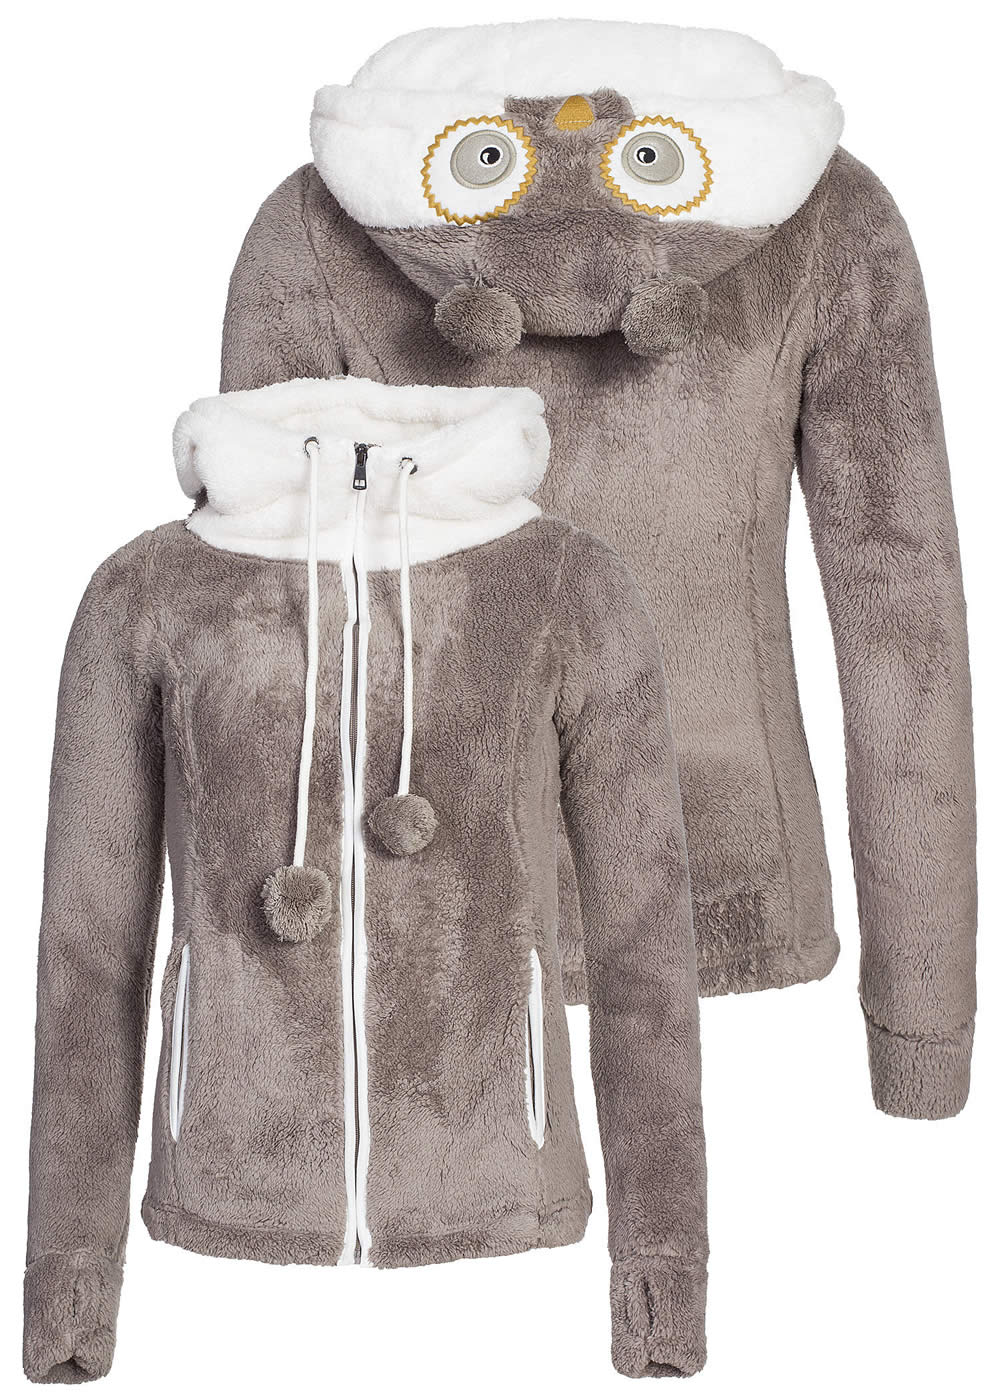 eight2nine damen teddy fleece jacke eule kapuze mit ohren. Black Bedroom Furniture Sets. Home Design Ideas